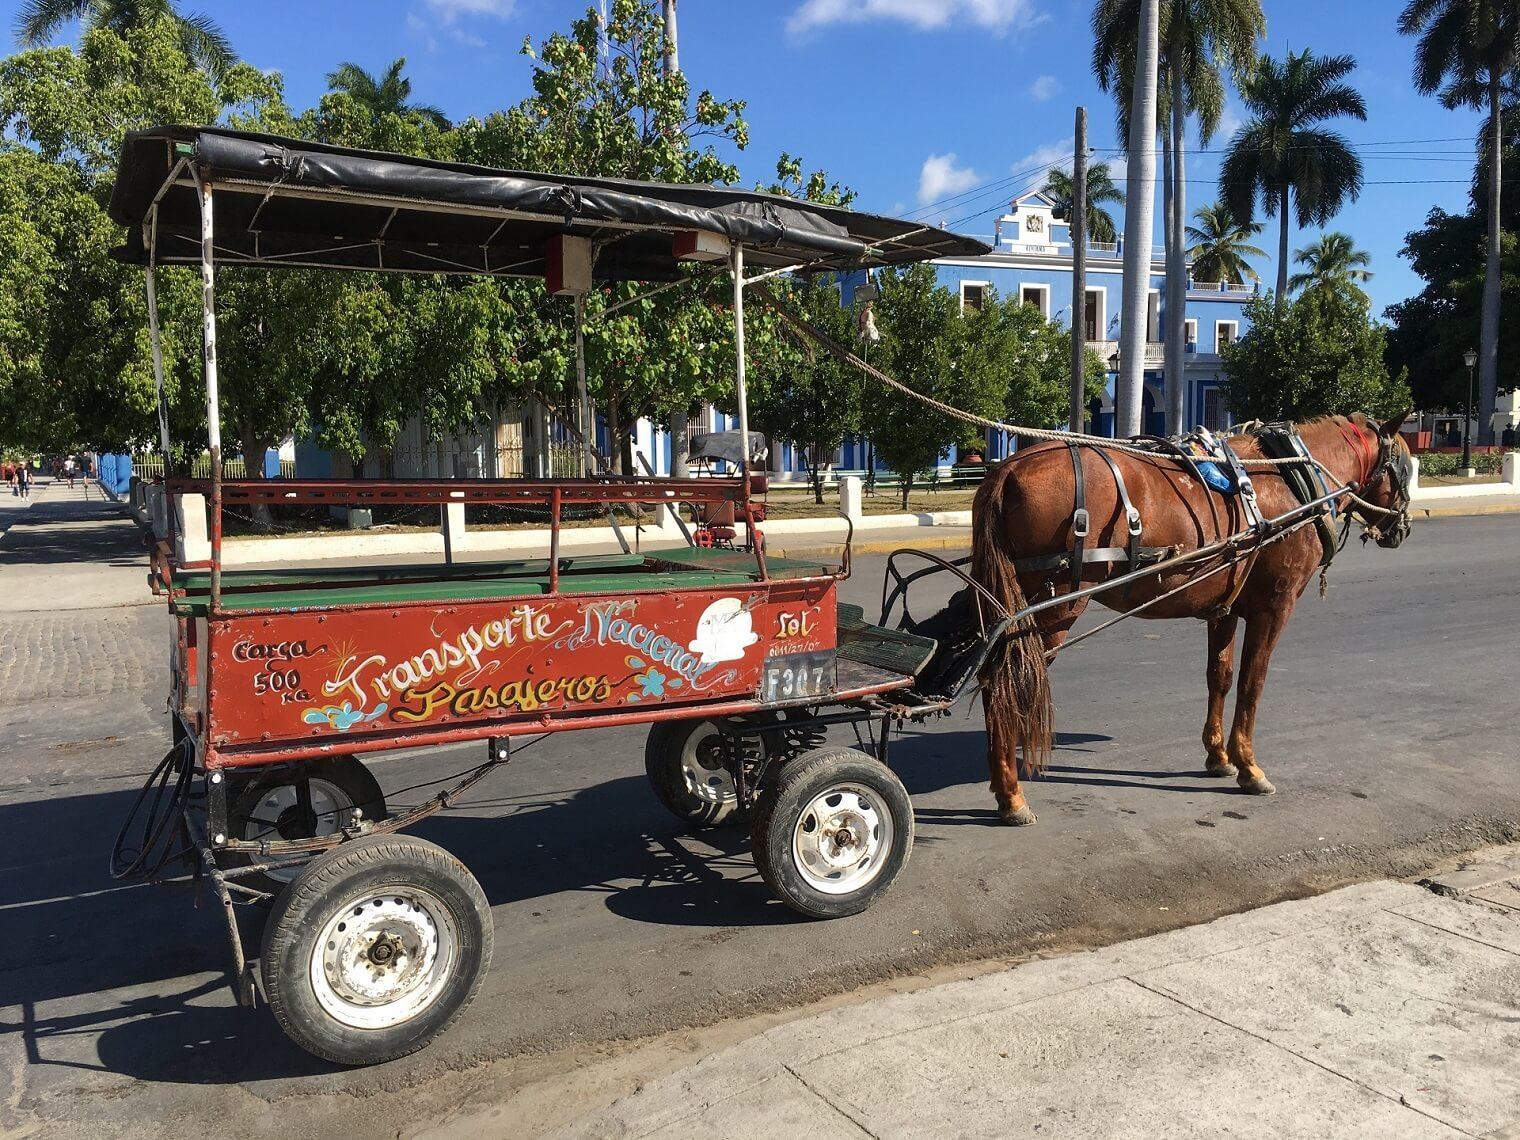 Cuban transportation taxis